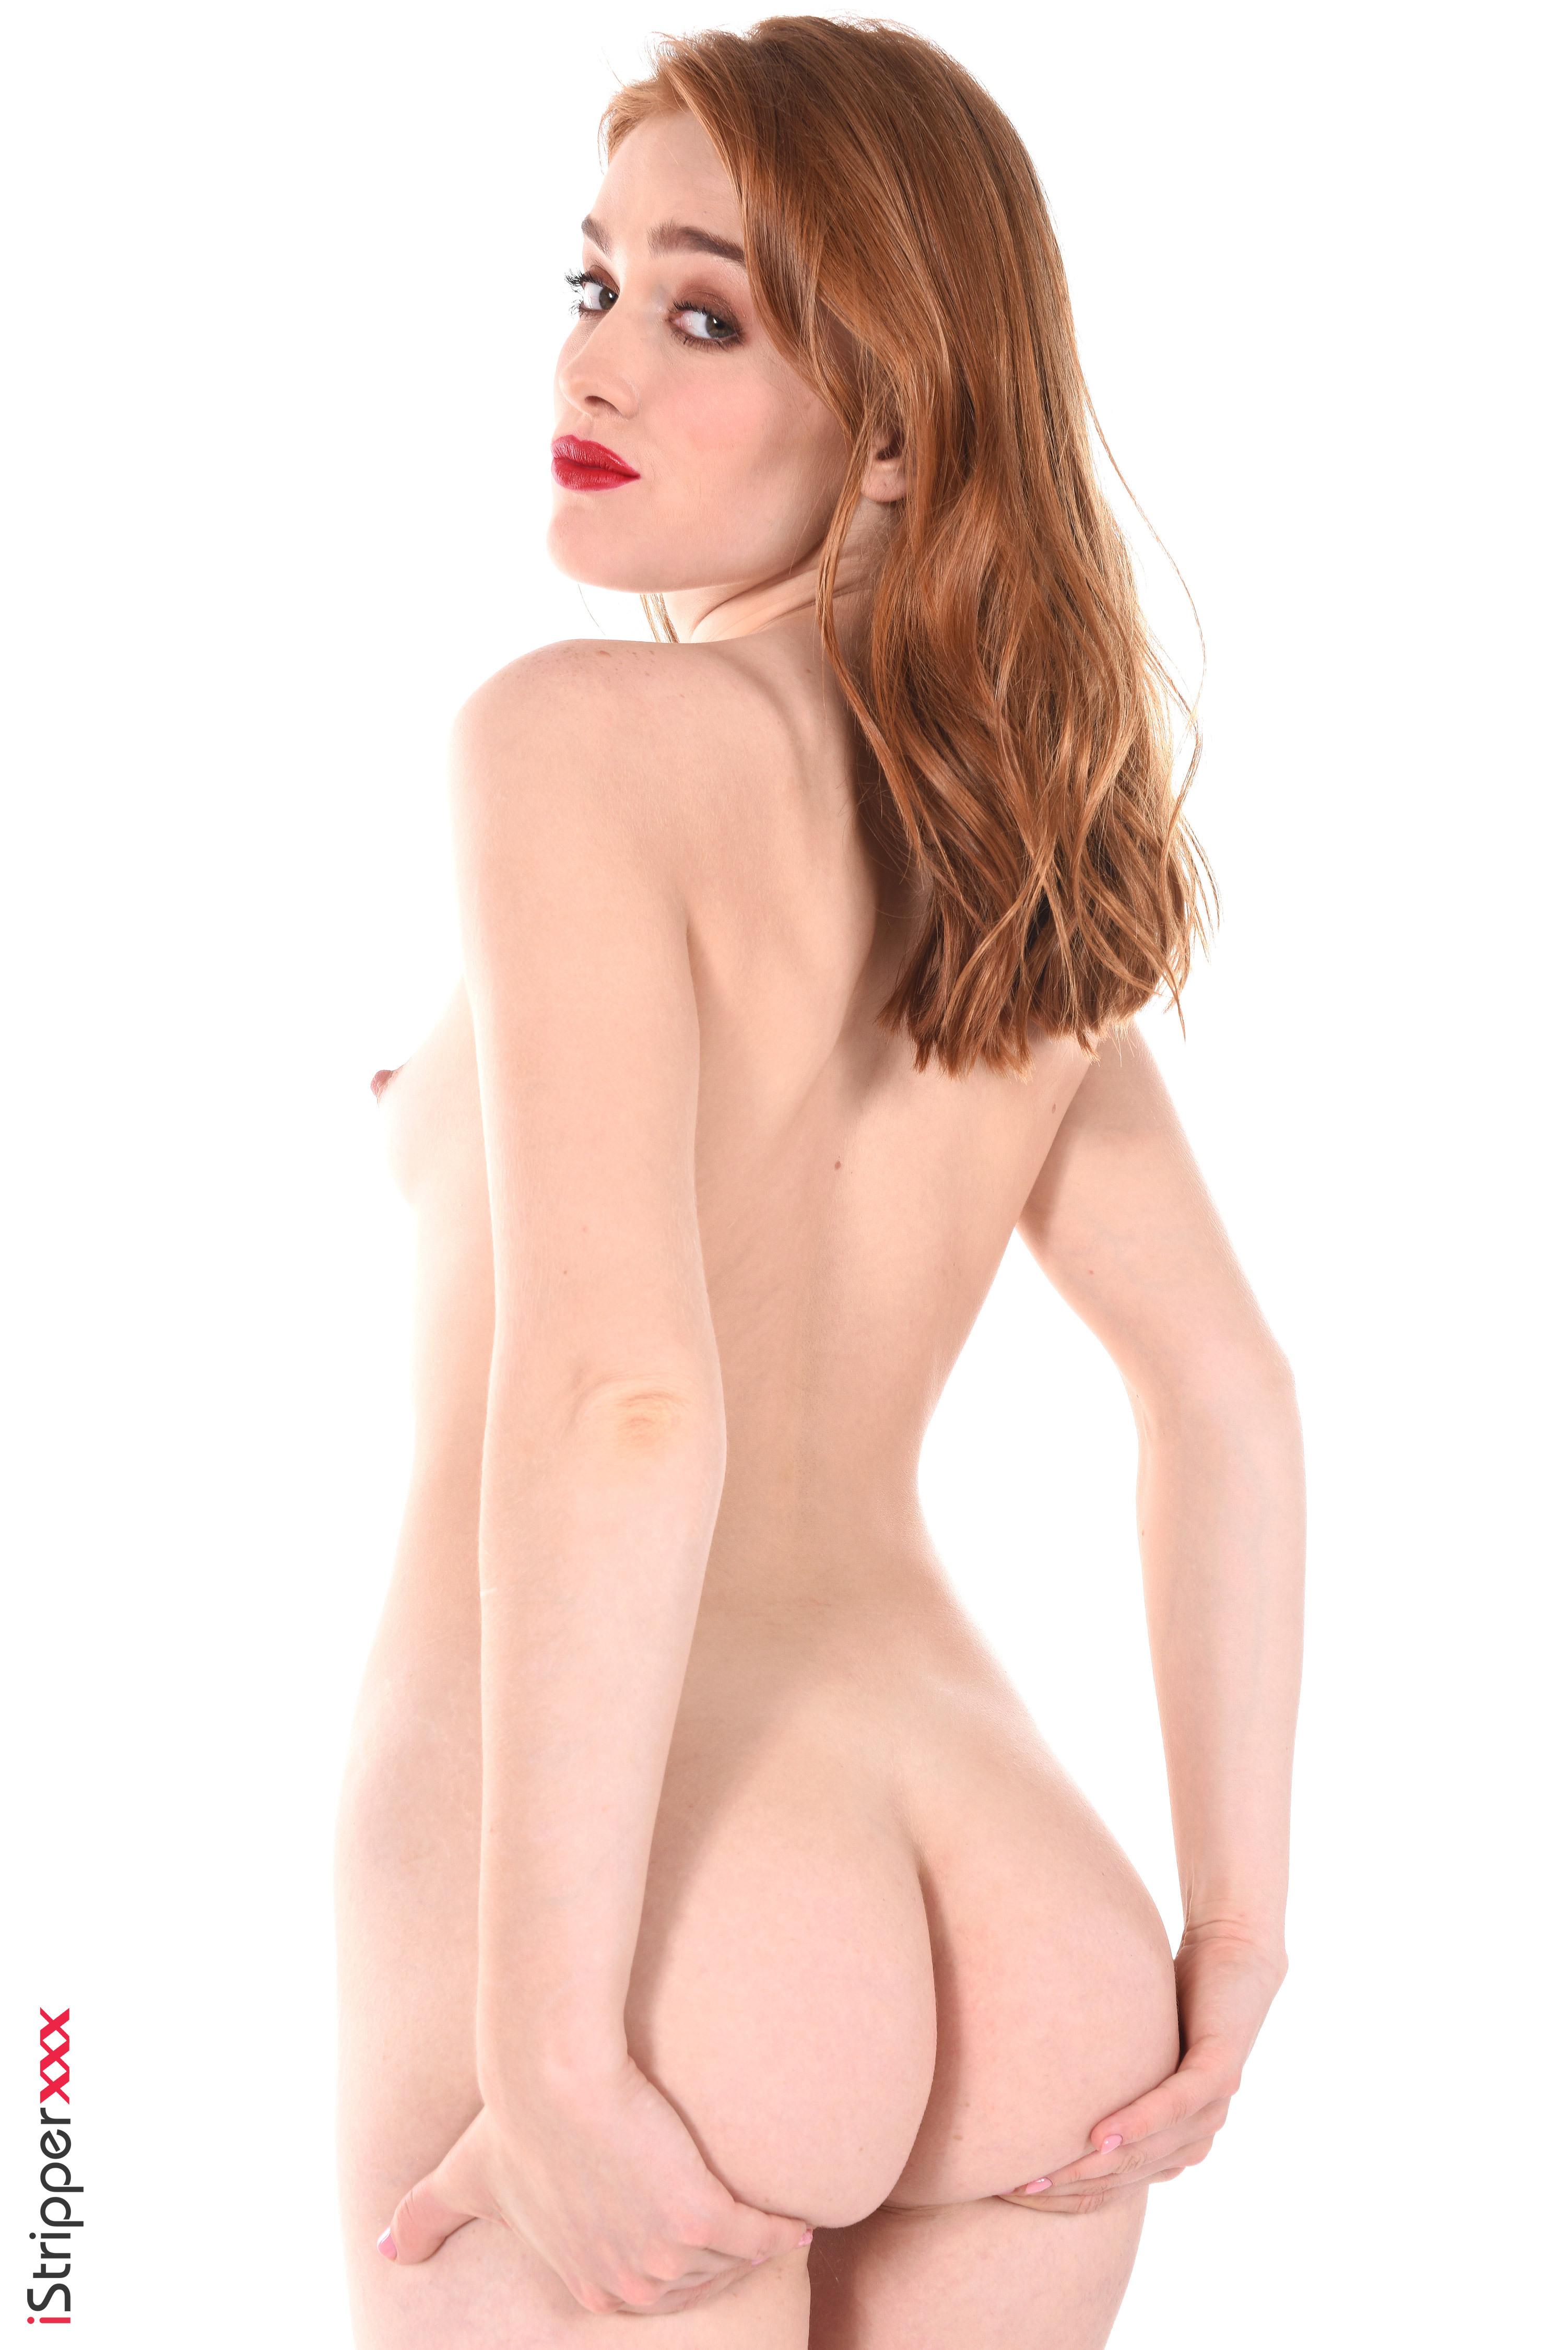 nude weoman bikinis wallpapers